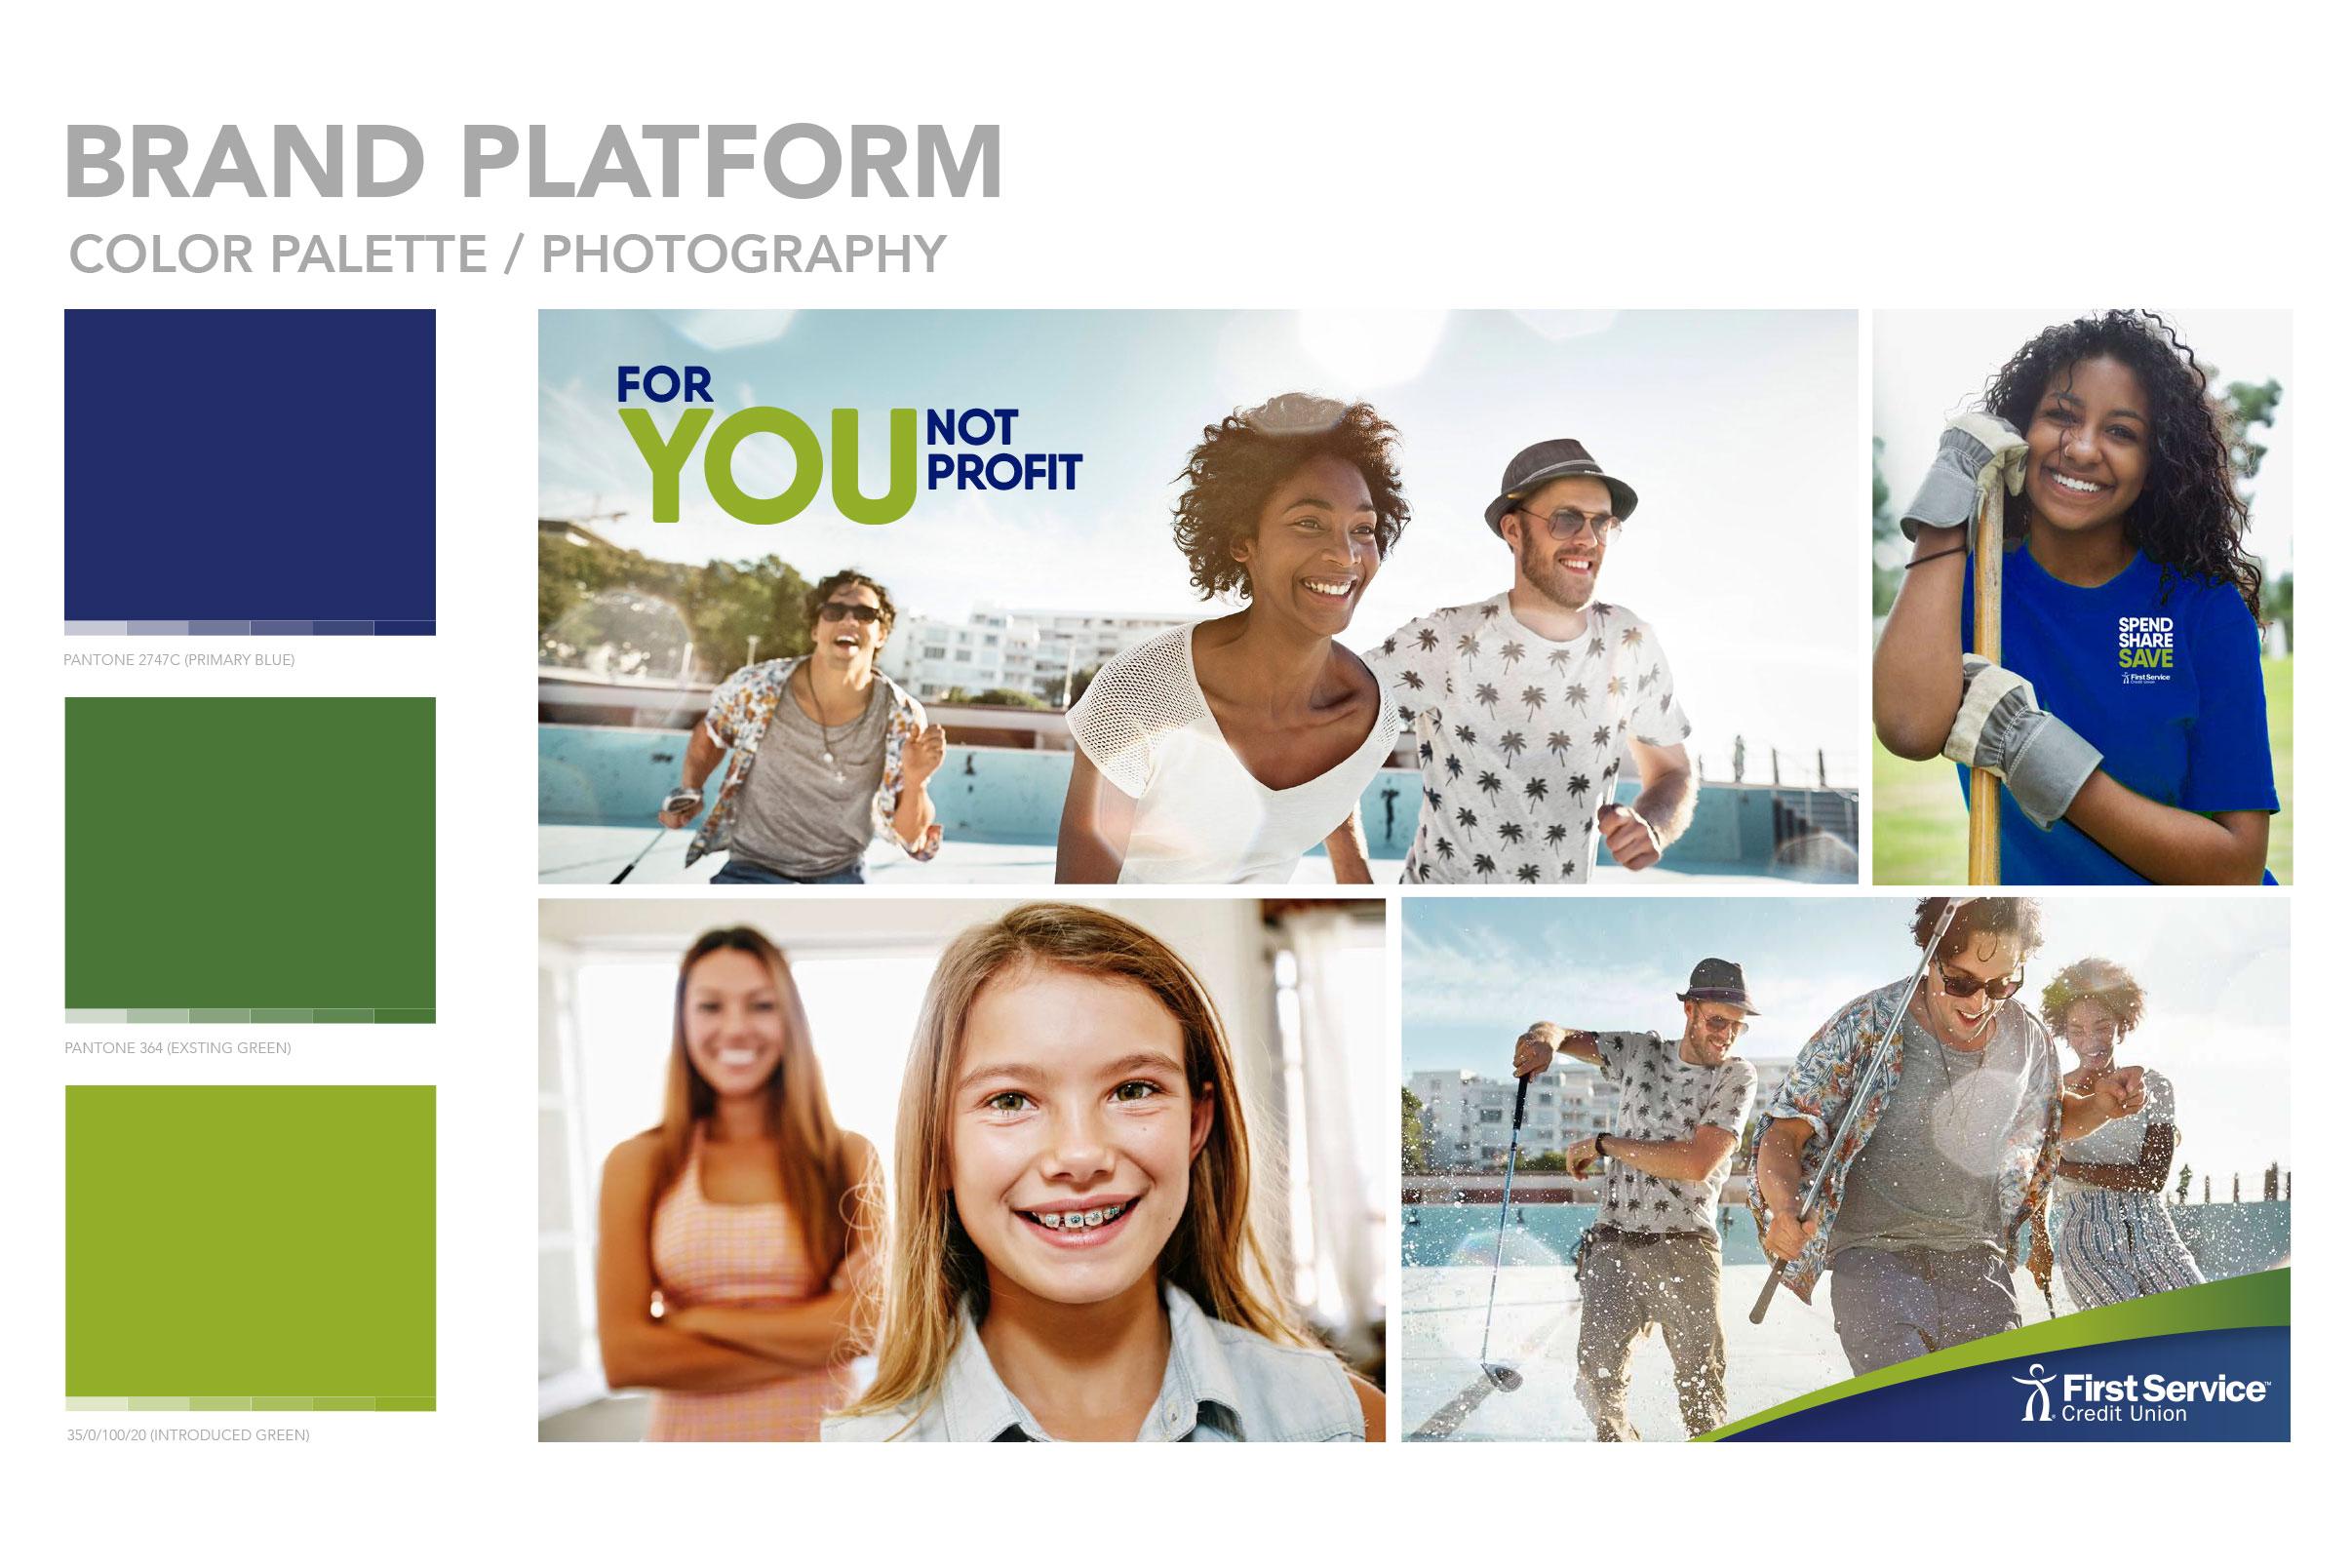 First Service Credit Union – brand platform attributes